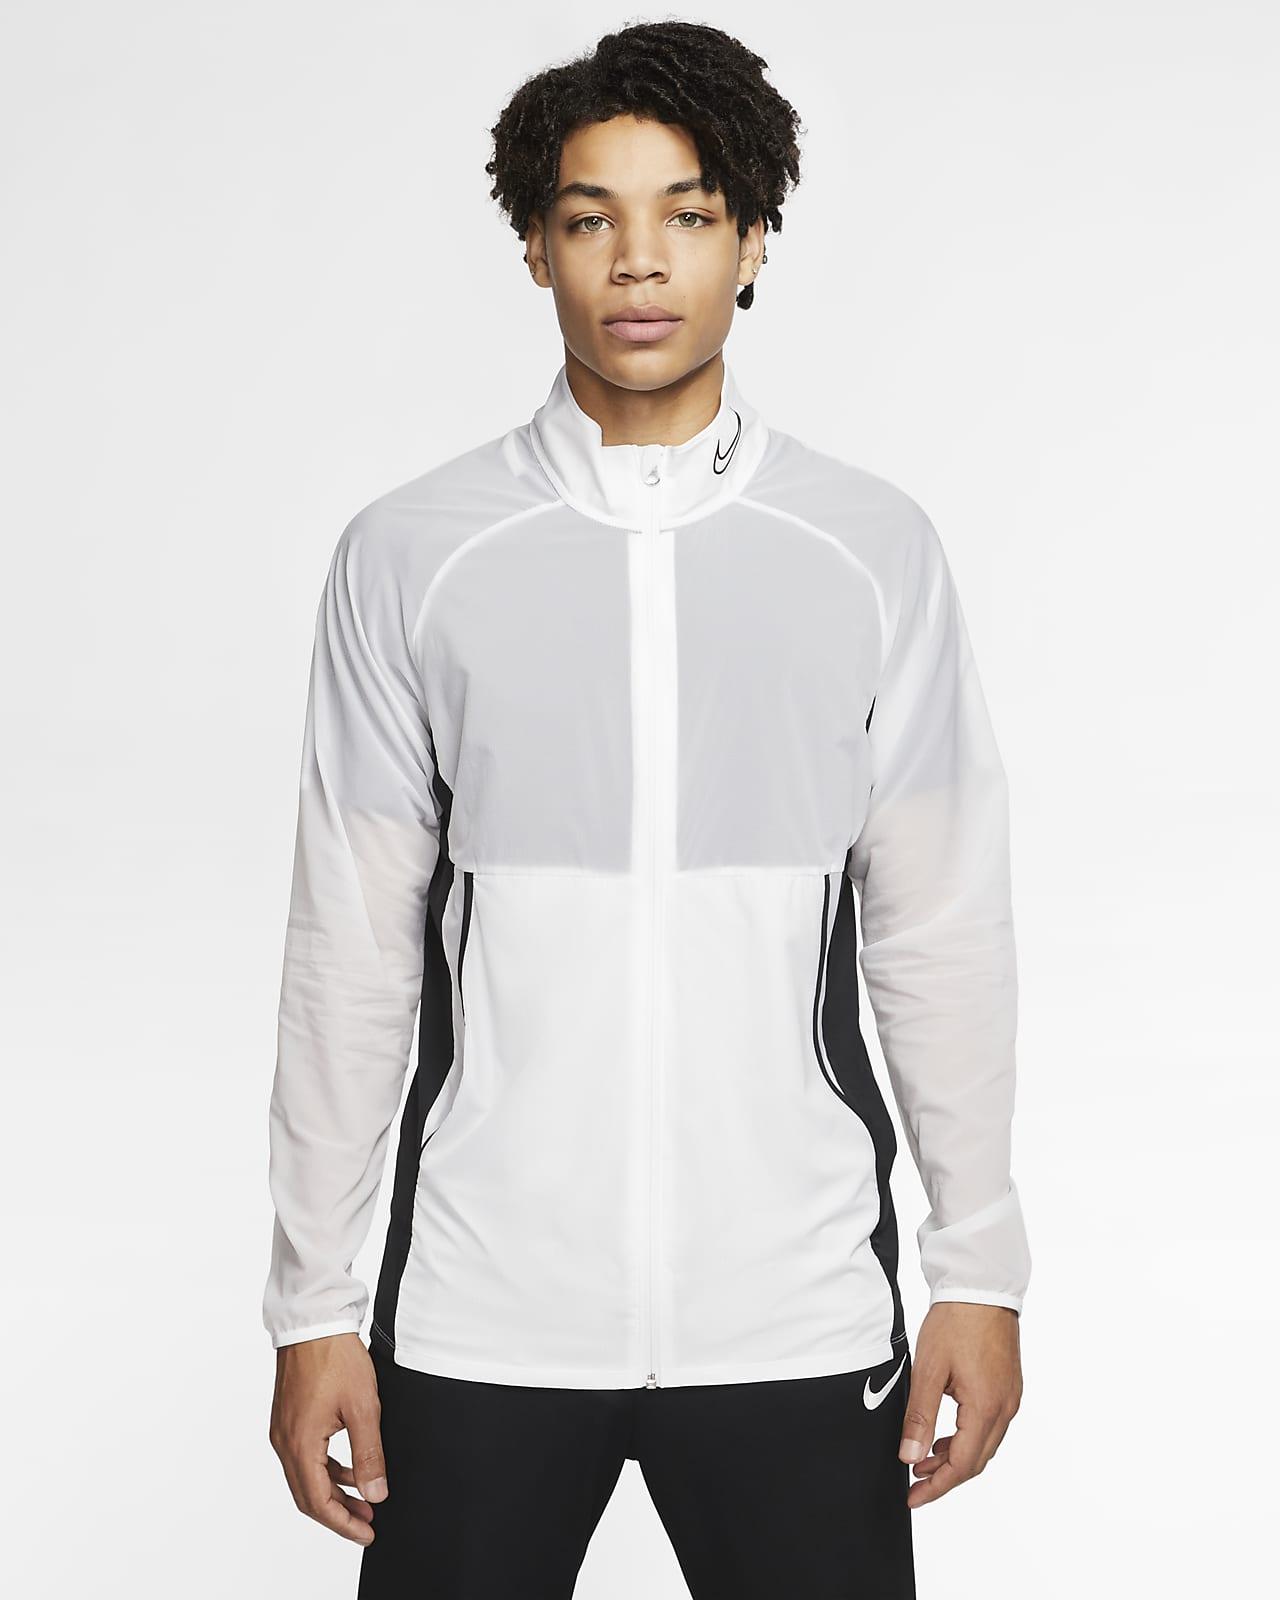 Nike Academy Men's Soccer Jacket